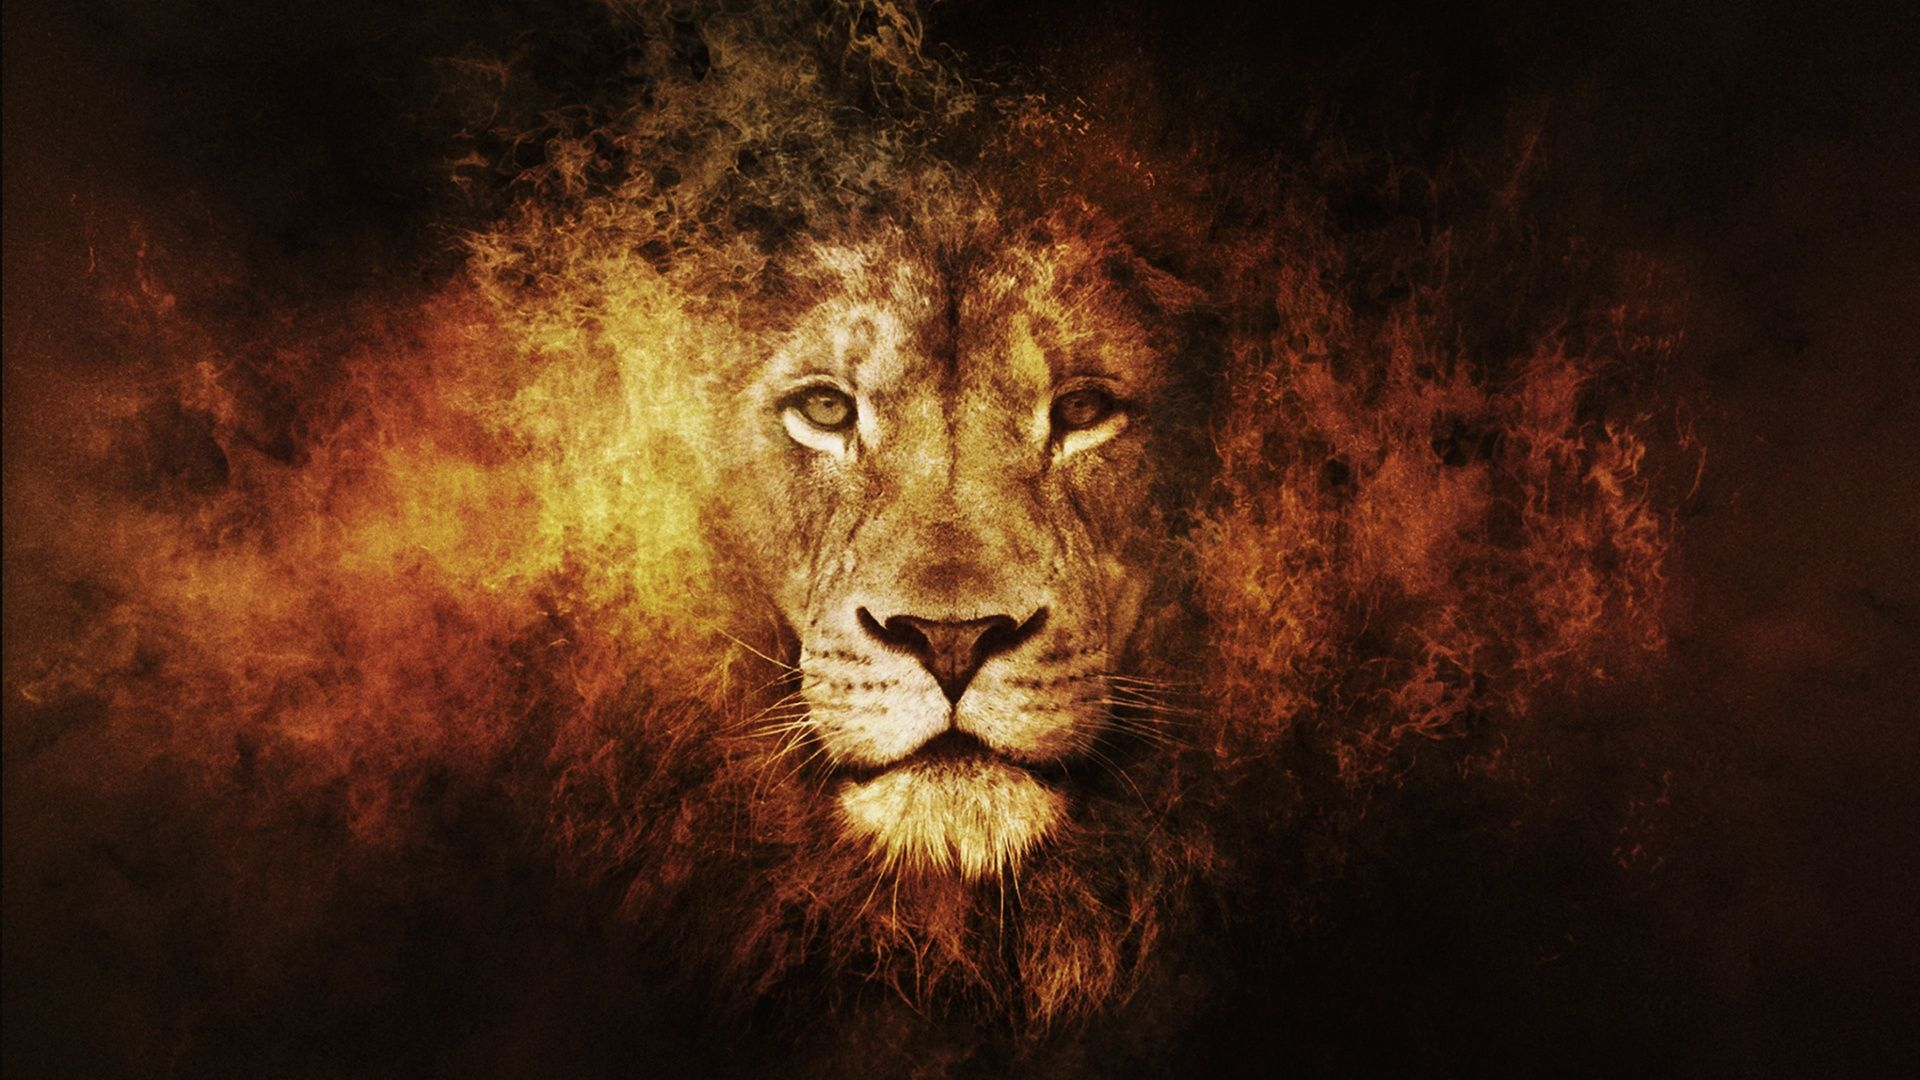 Desktop Lion Hd Wallpapers 1080p Lion Hd Wallpaper Lion